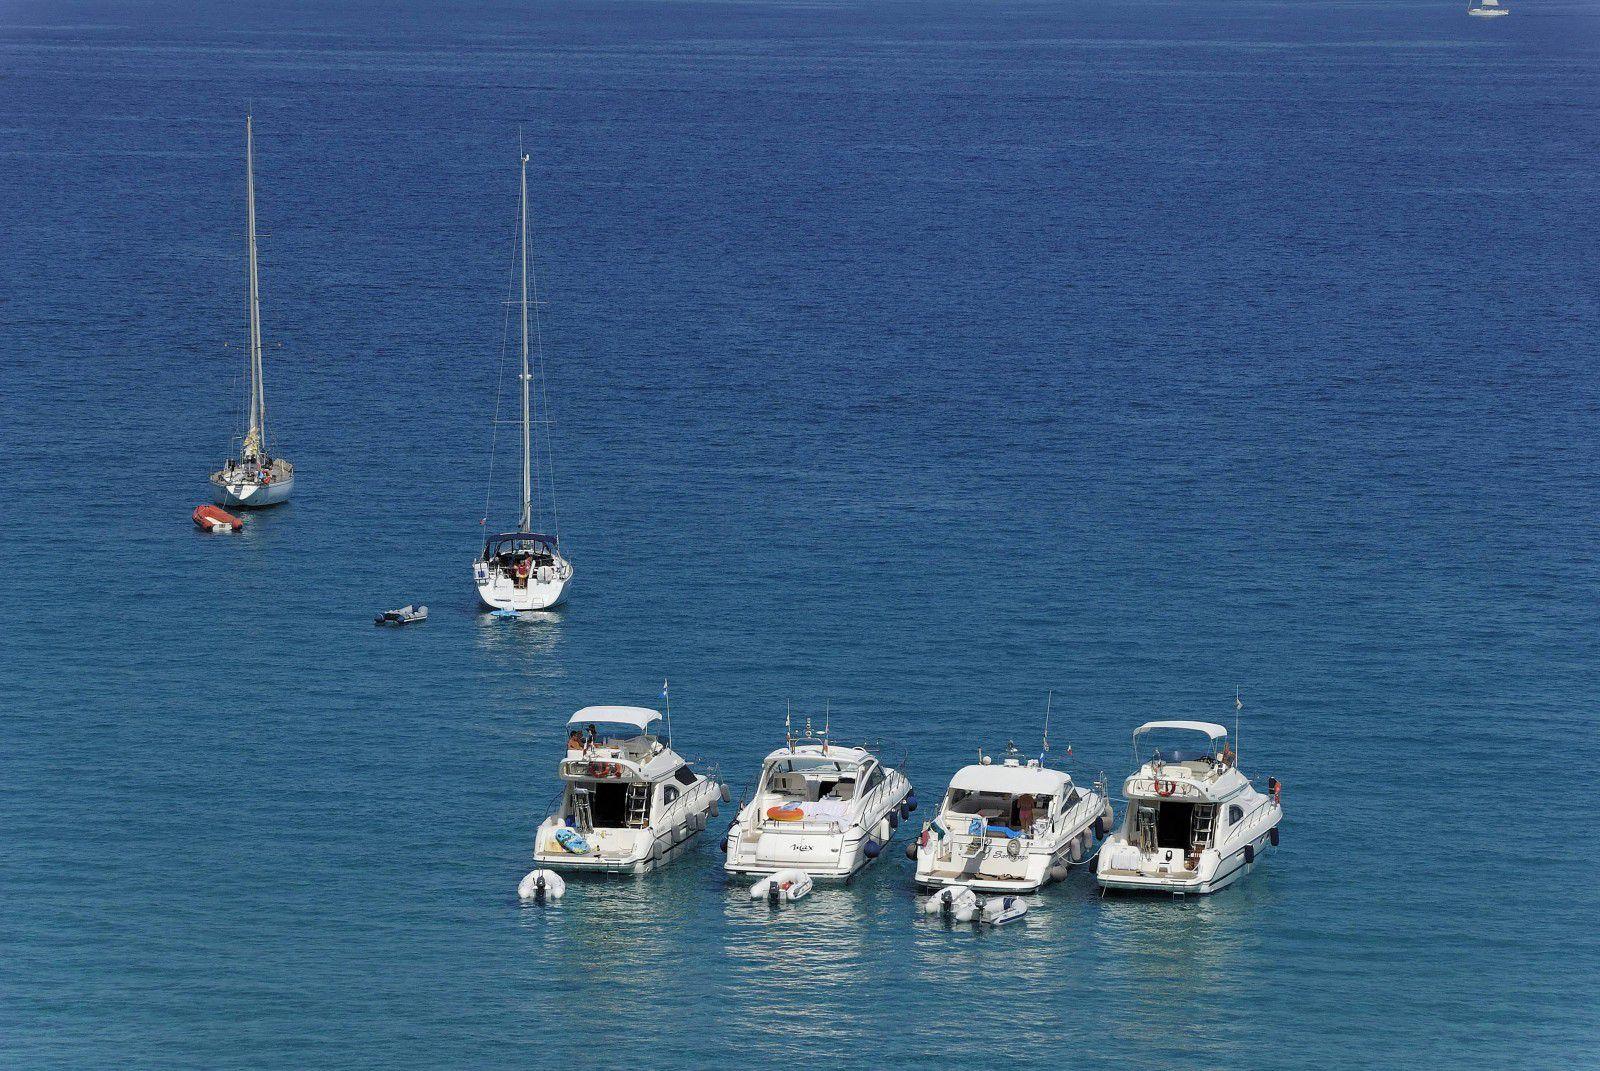 bateaux2 DxO